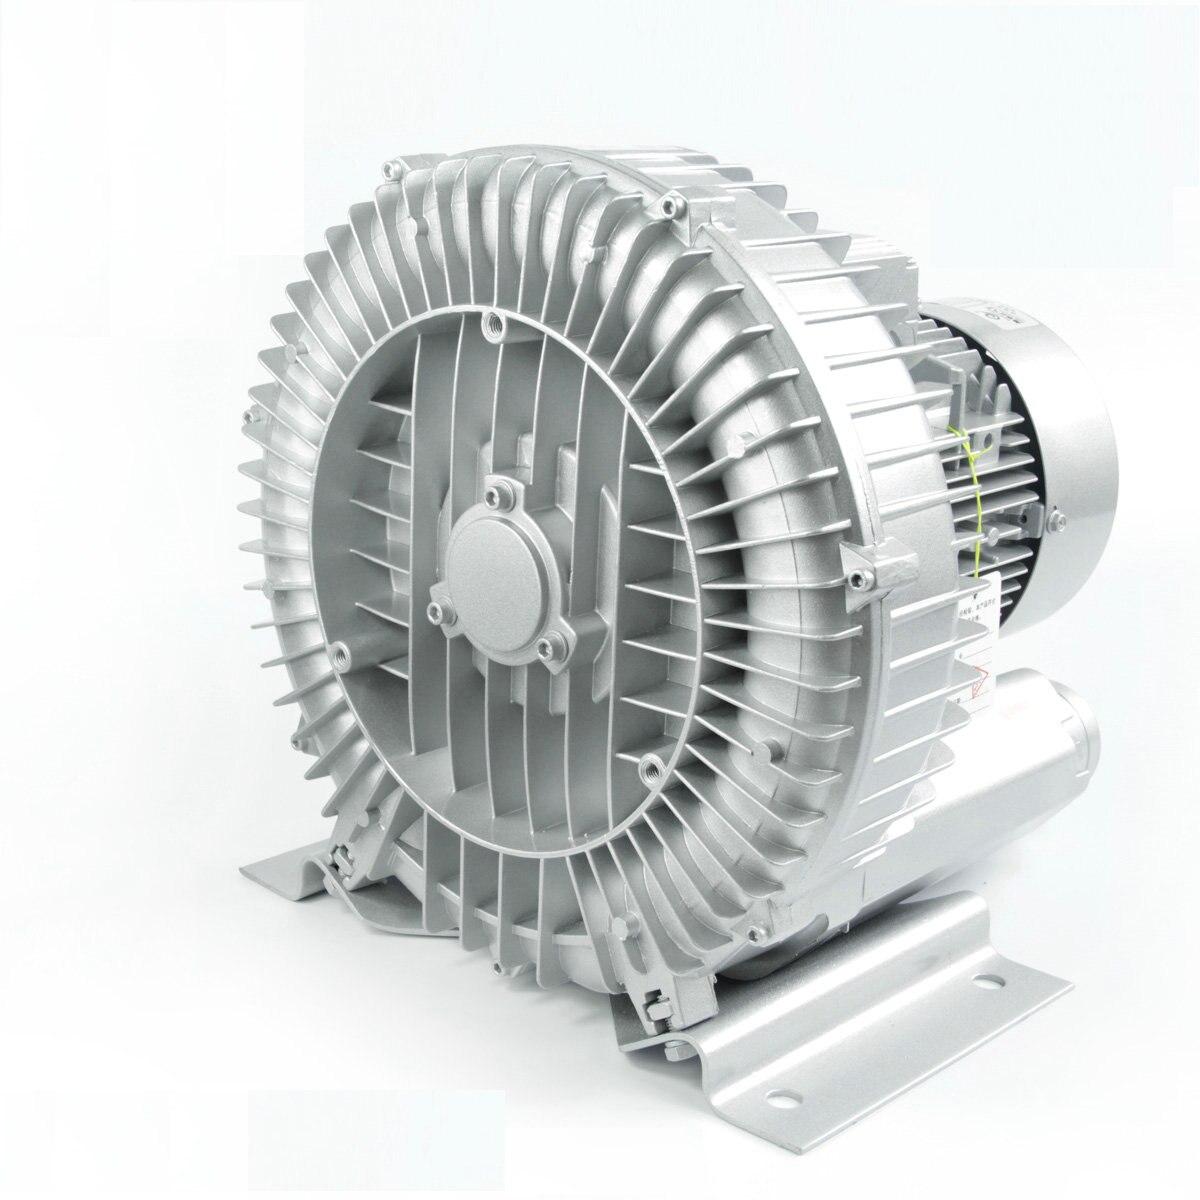 250W High pressure air vortex pump / high pressure pump vortex pump / fish pond aerator / air compressor pressure blower